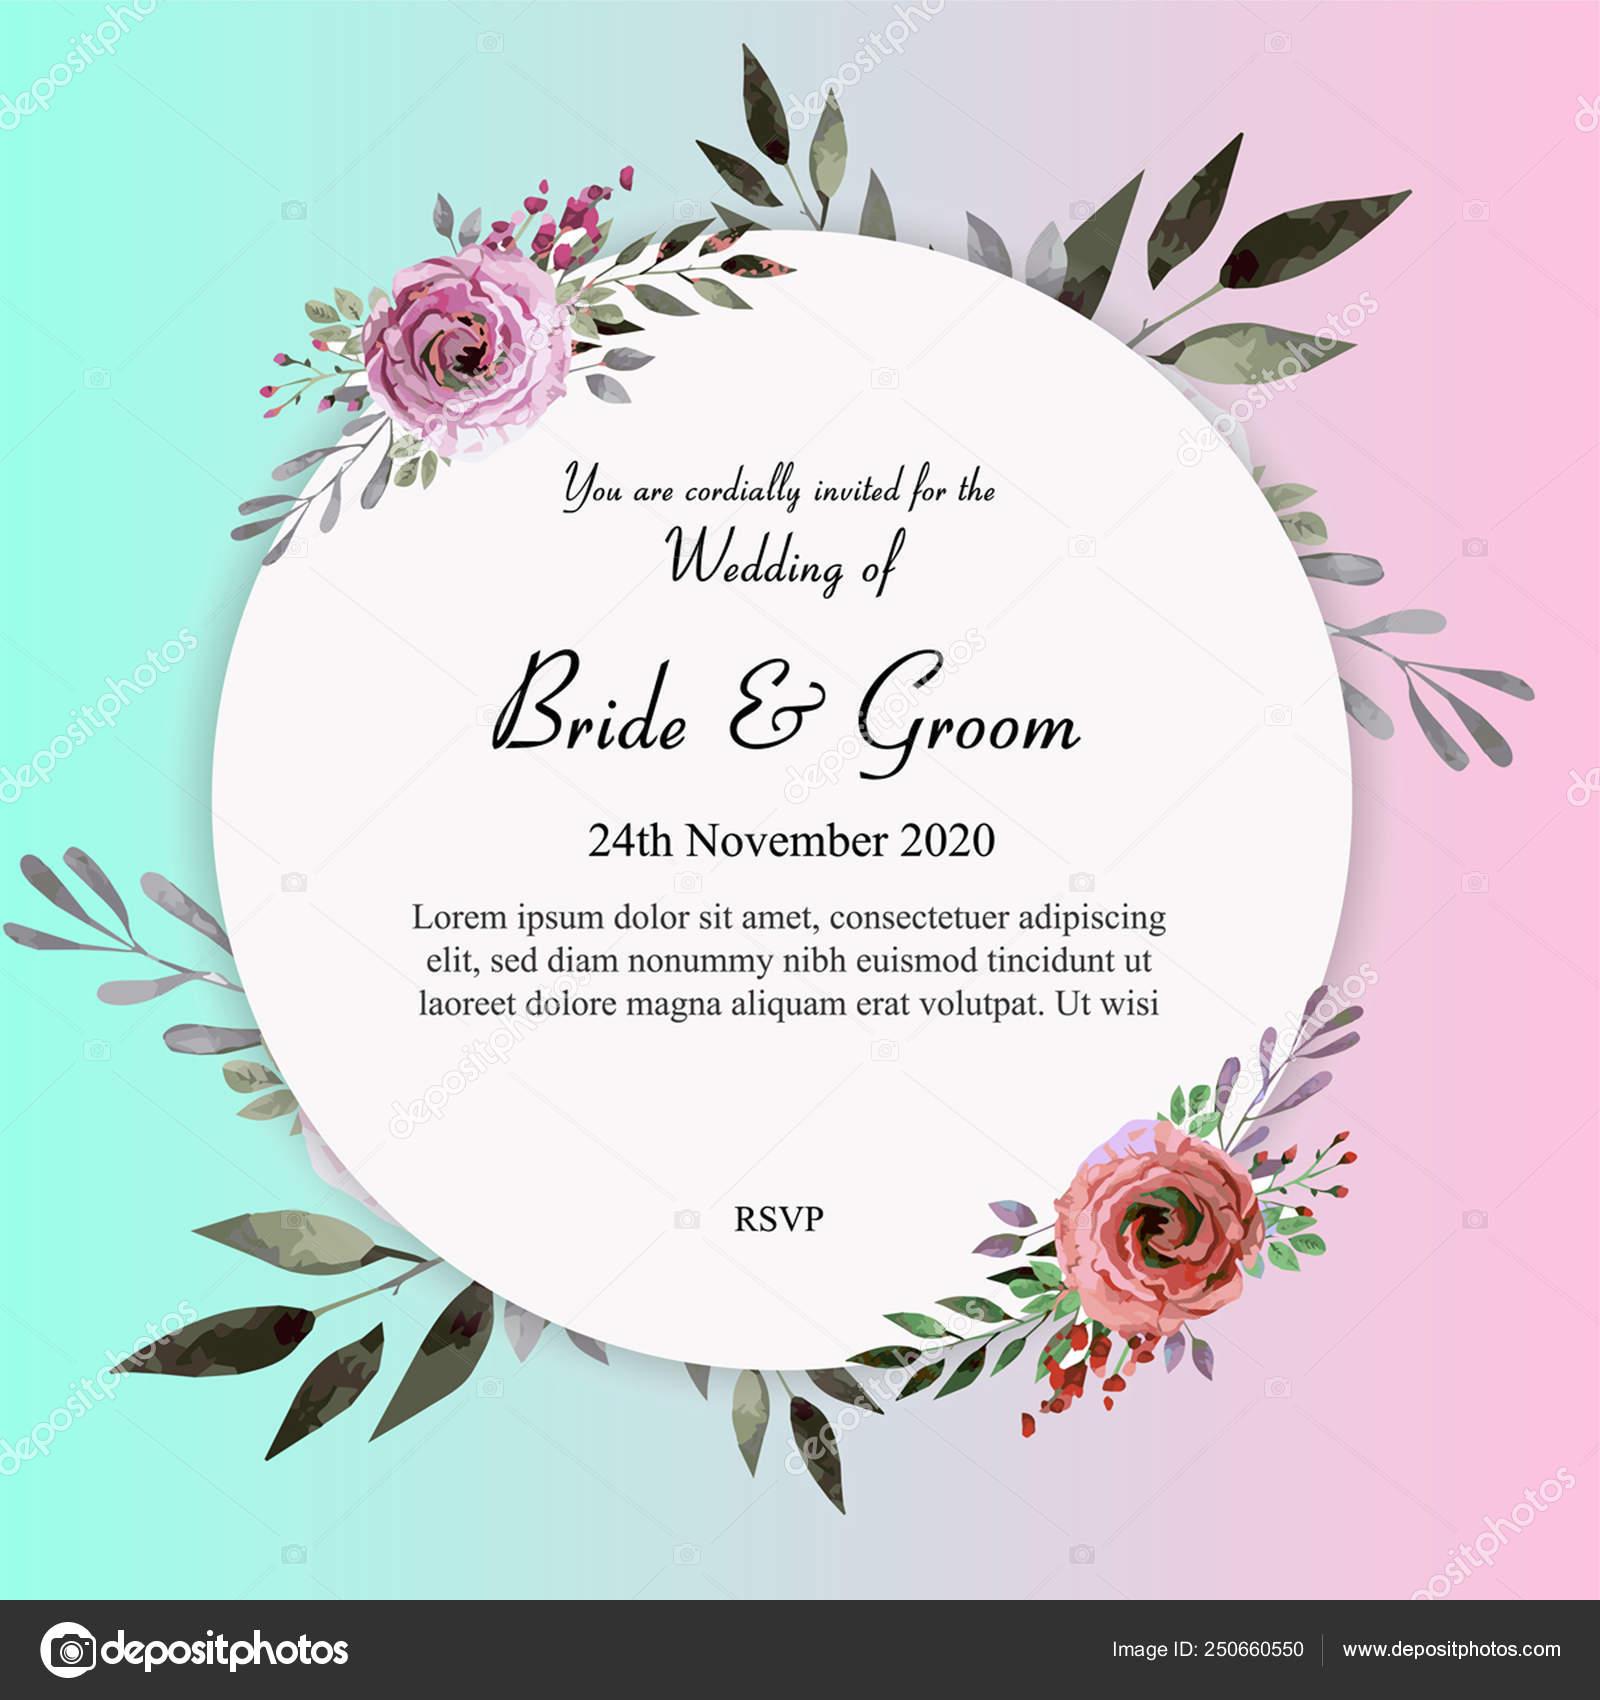 Watercolour Floral Wedding Invitation Template — Stock Vector ...